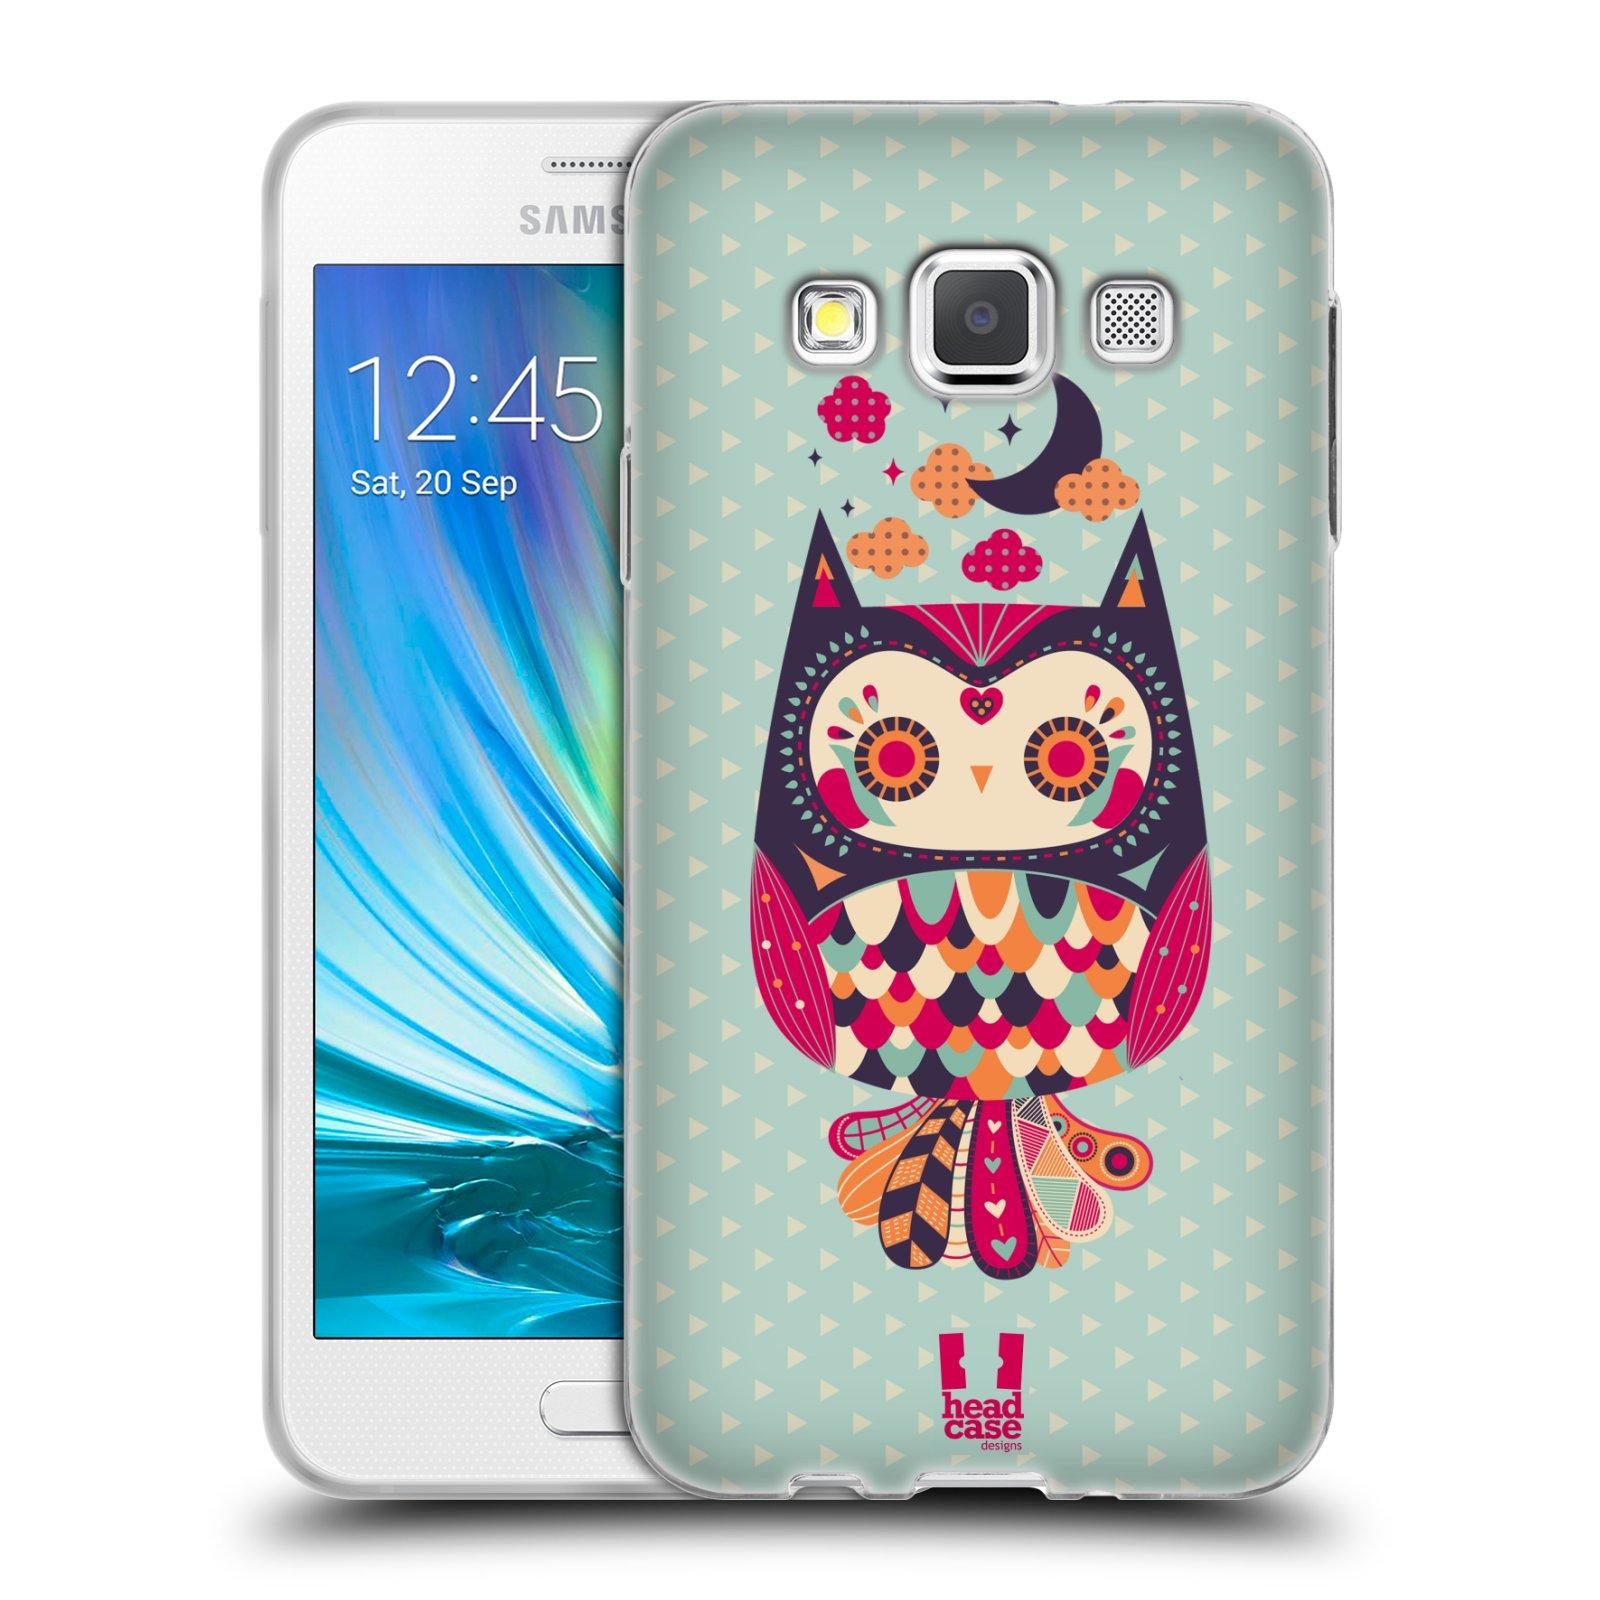 HEAD CASE silikonový obal na mobil Samsung Galaxy A3 vzor Stmívání sovička růžová a fialová